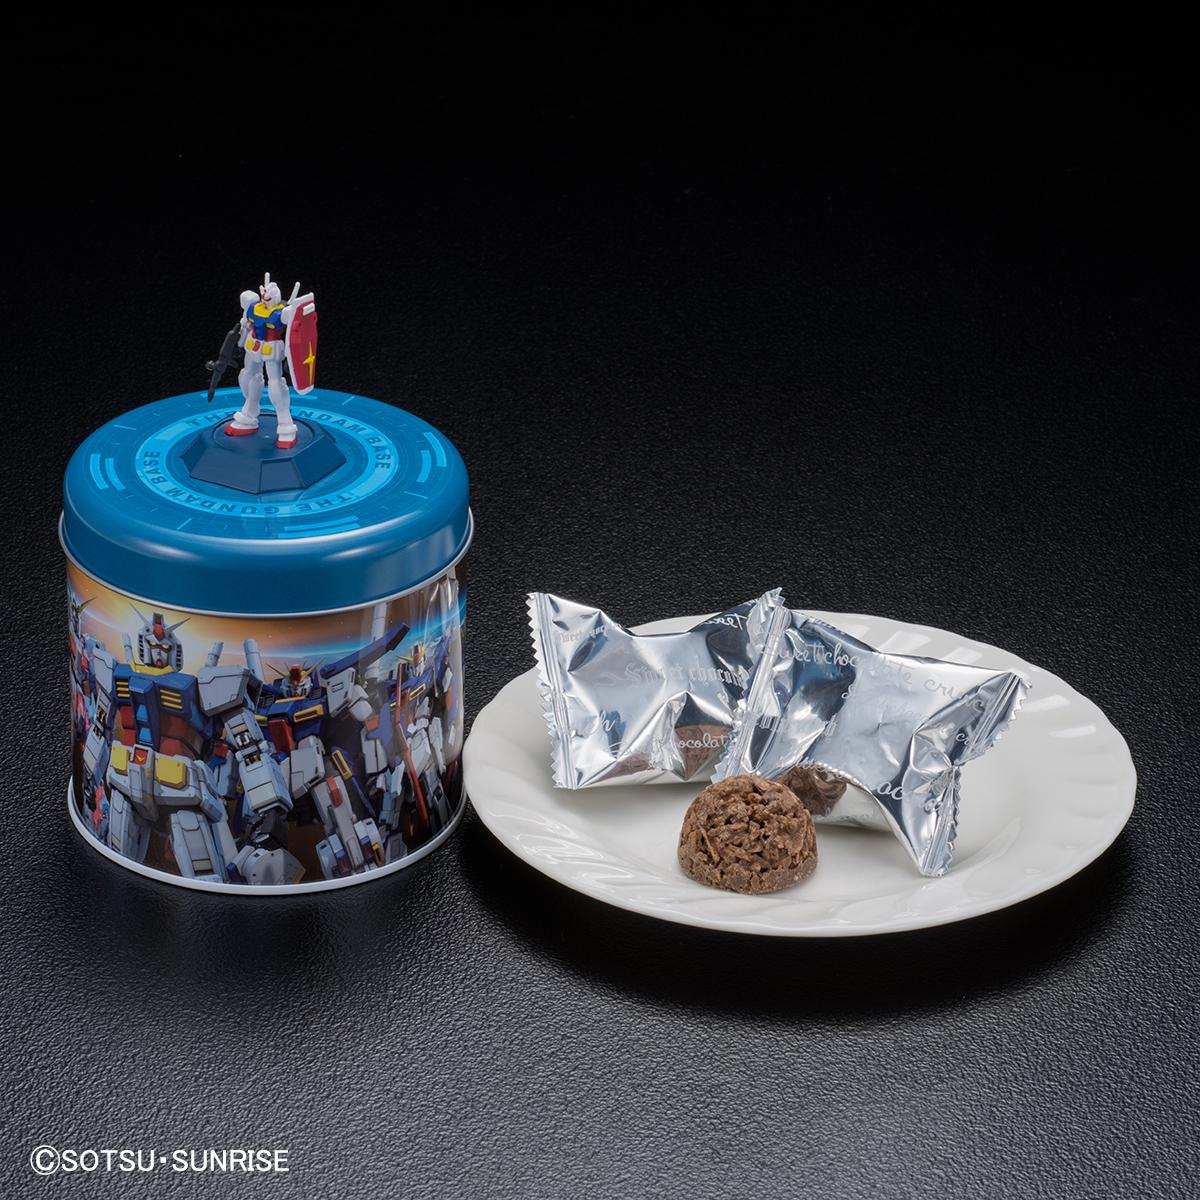 THE GUNDAM BASE ガンダム缶クランチ 商品画像